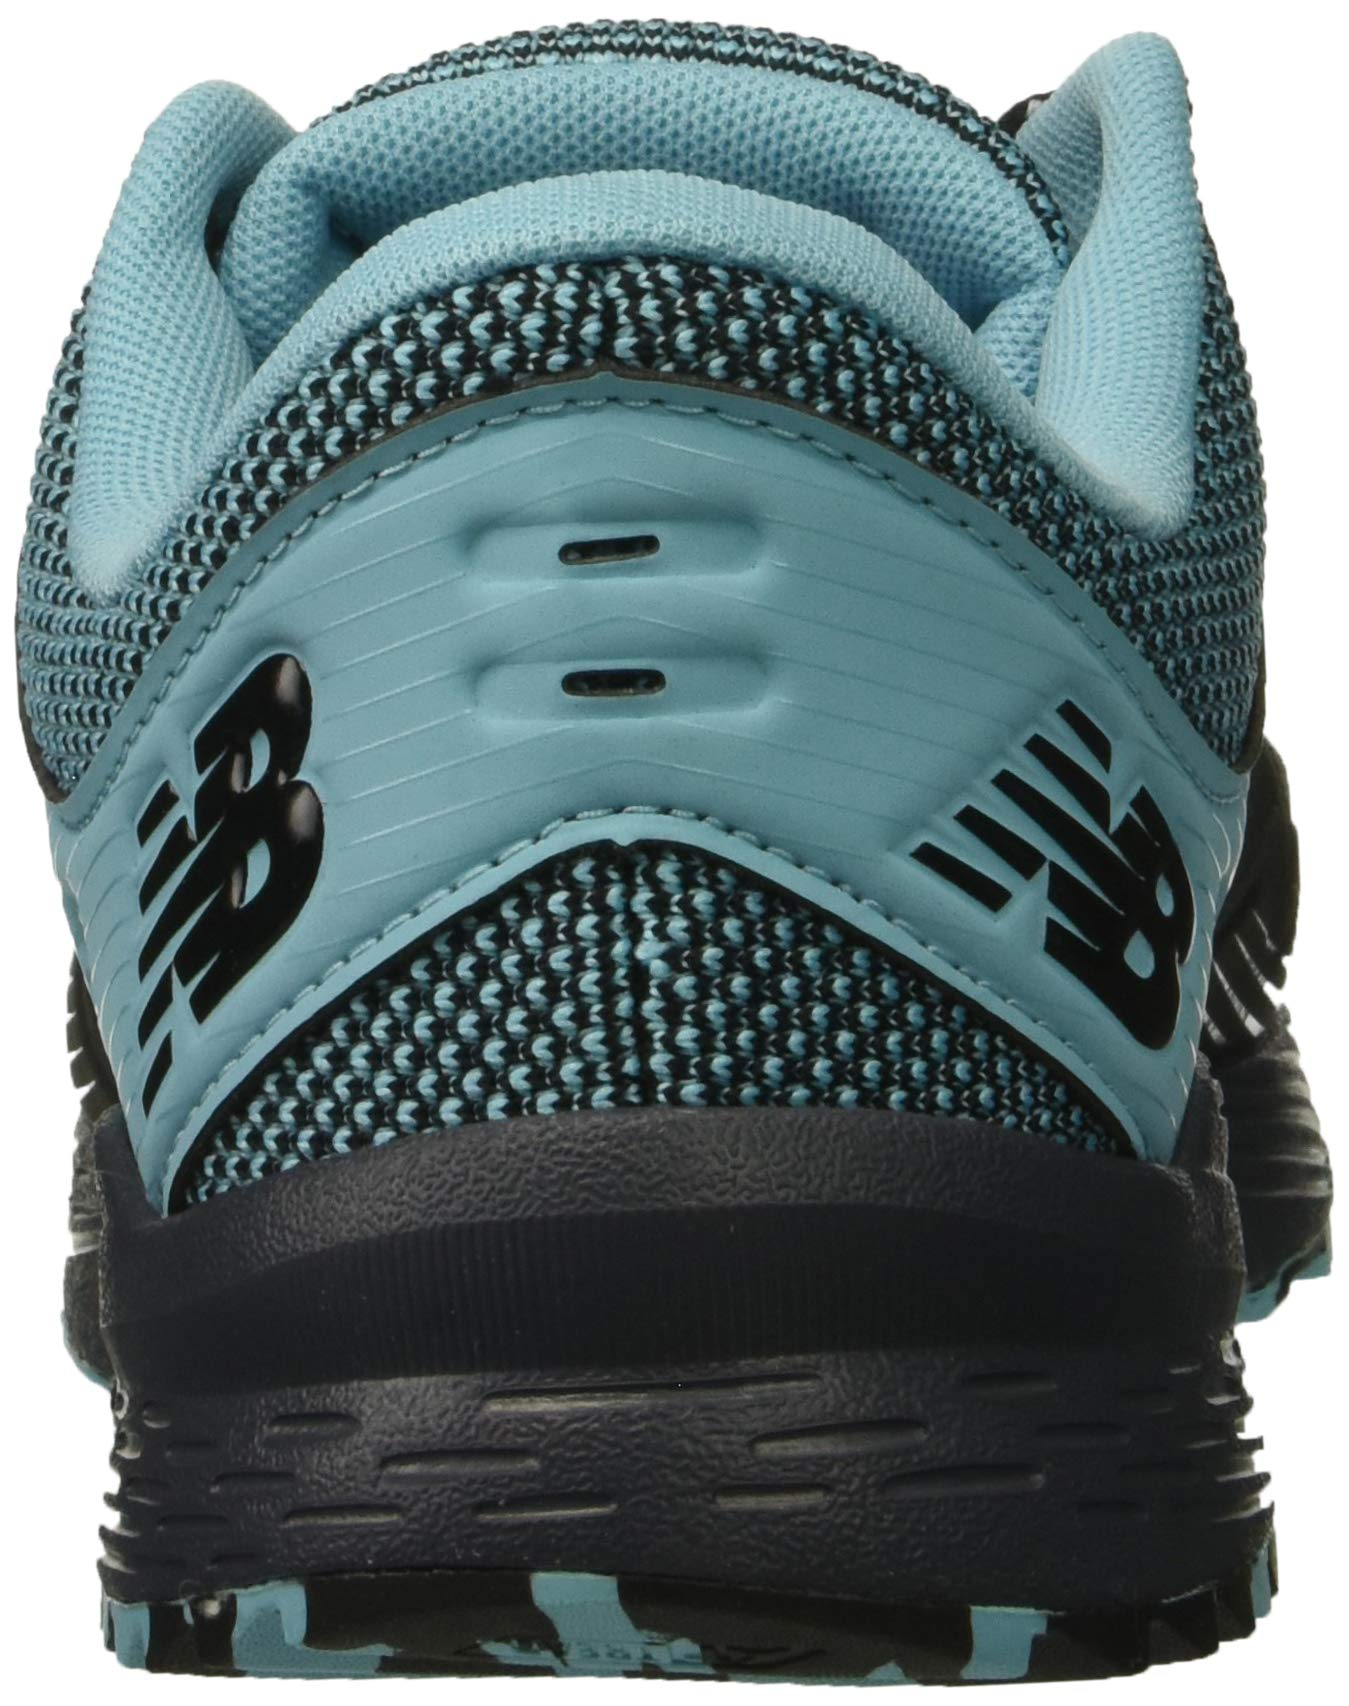 New Balance Women's Nitrel V2 FuelCore Trail Running Shoe Black/Thunder/Enamel Blue 5.5 B US by New Balance (Image #2)